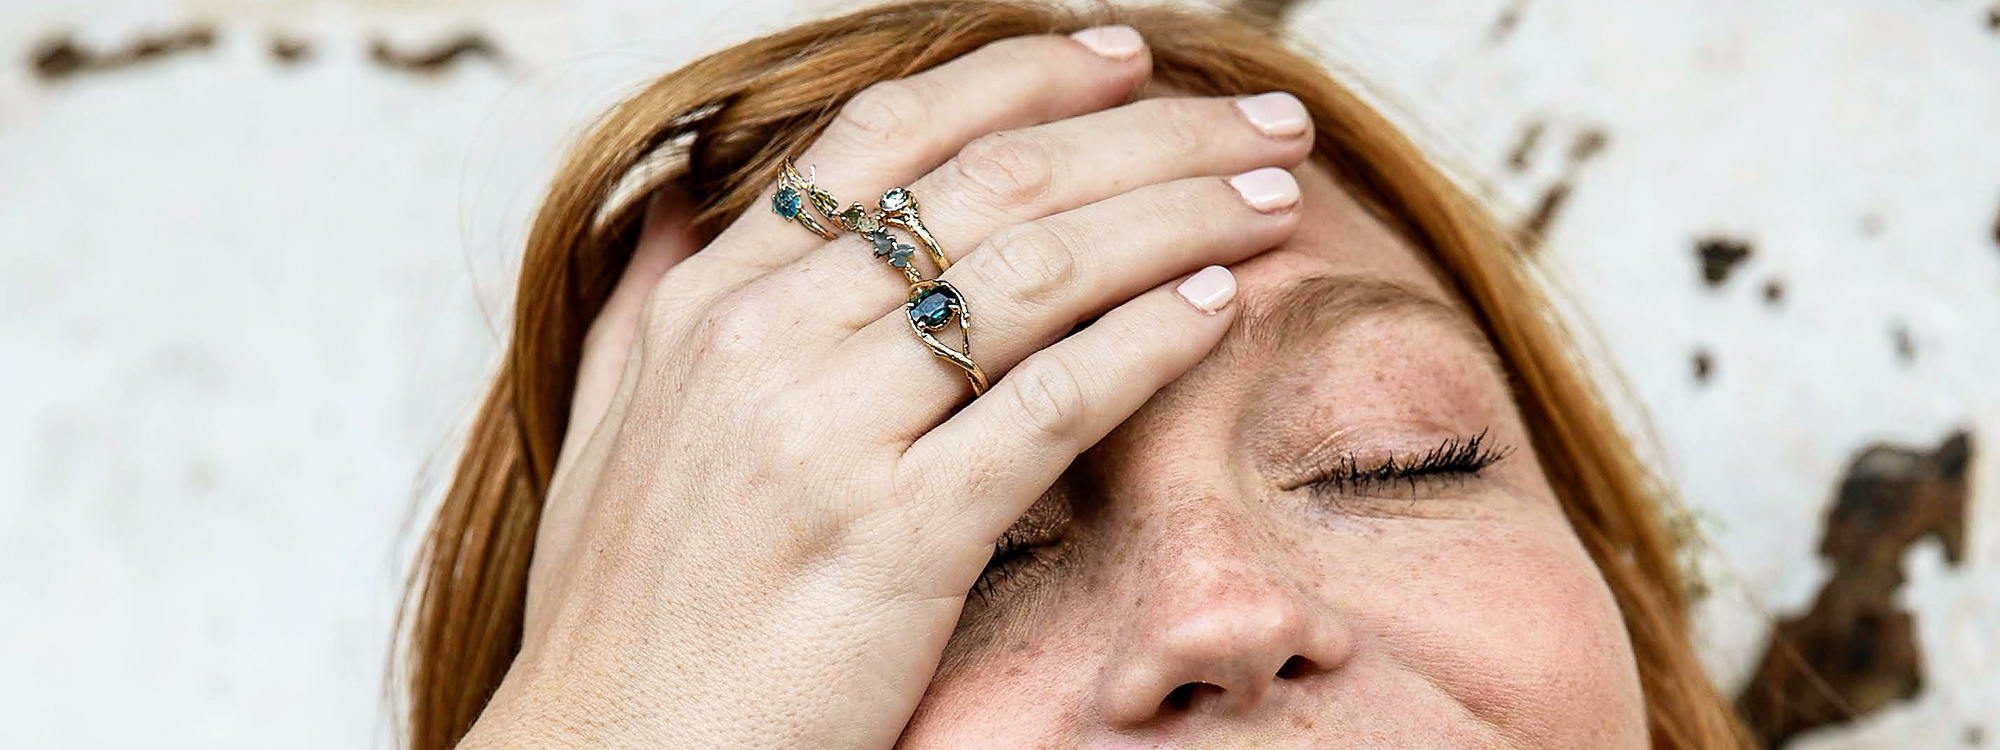 rough-montana-sapphire-engagement-rings-olivia-ewing-jewelry.jpg